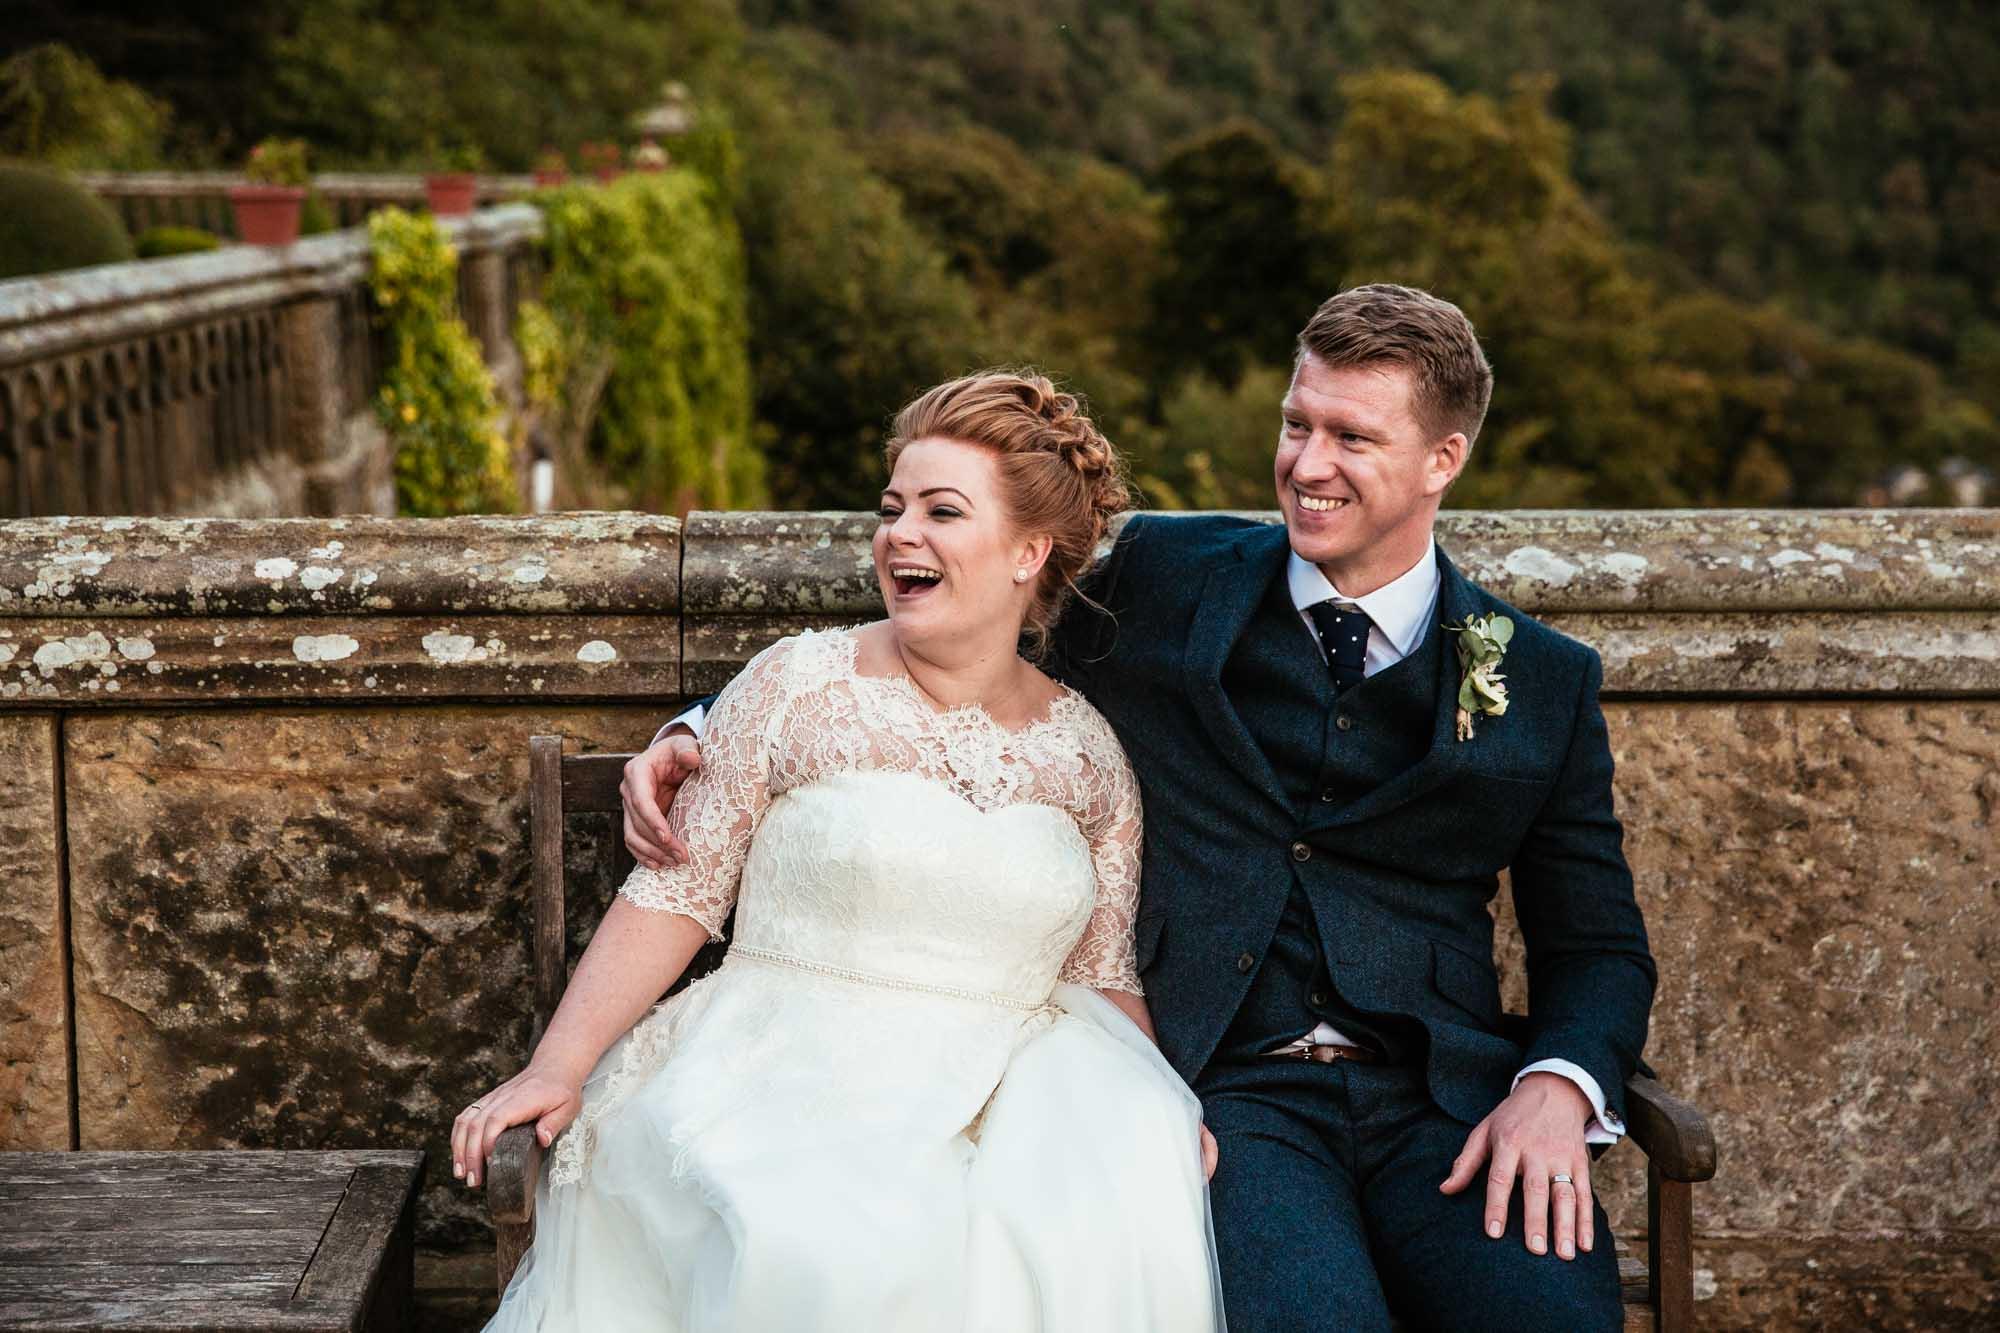 Wedding Photographer Cressbrook Hall